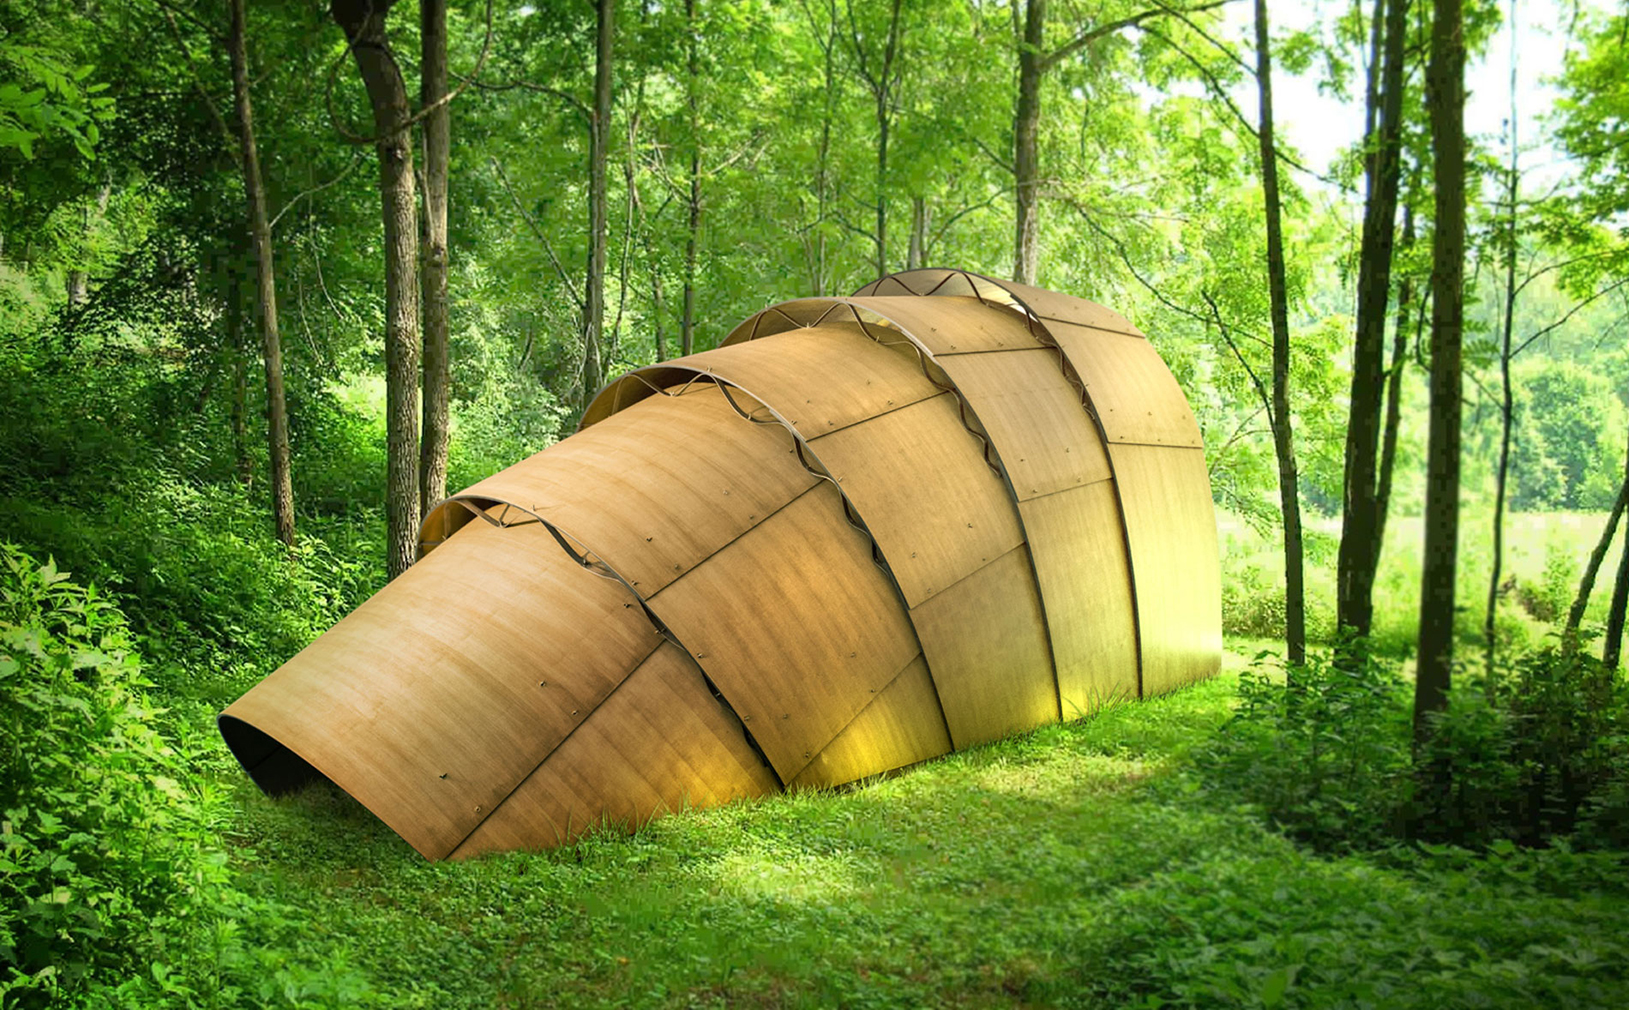 ron-arad-rmadillo-tea-pavilion-revolution-precrafted-properties